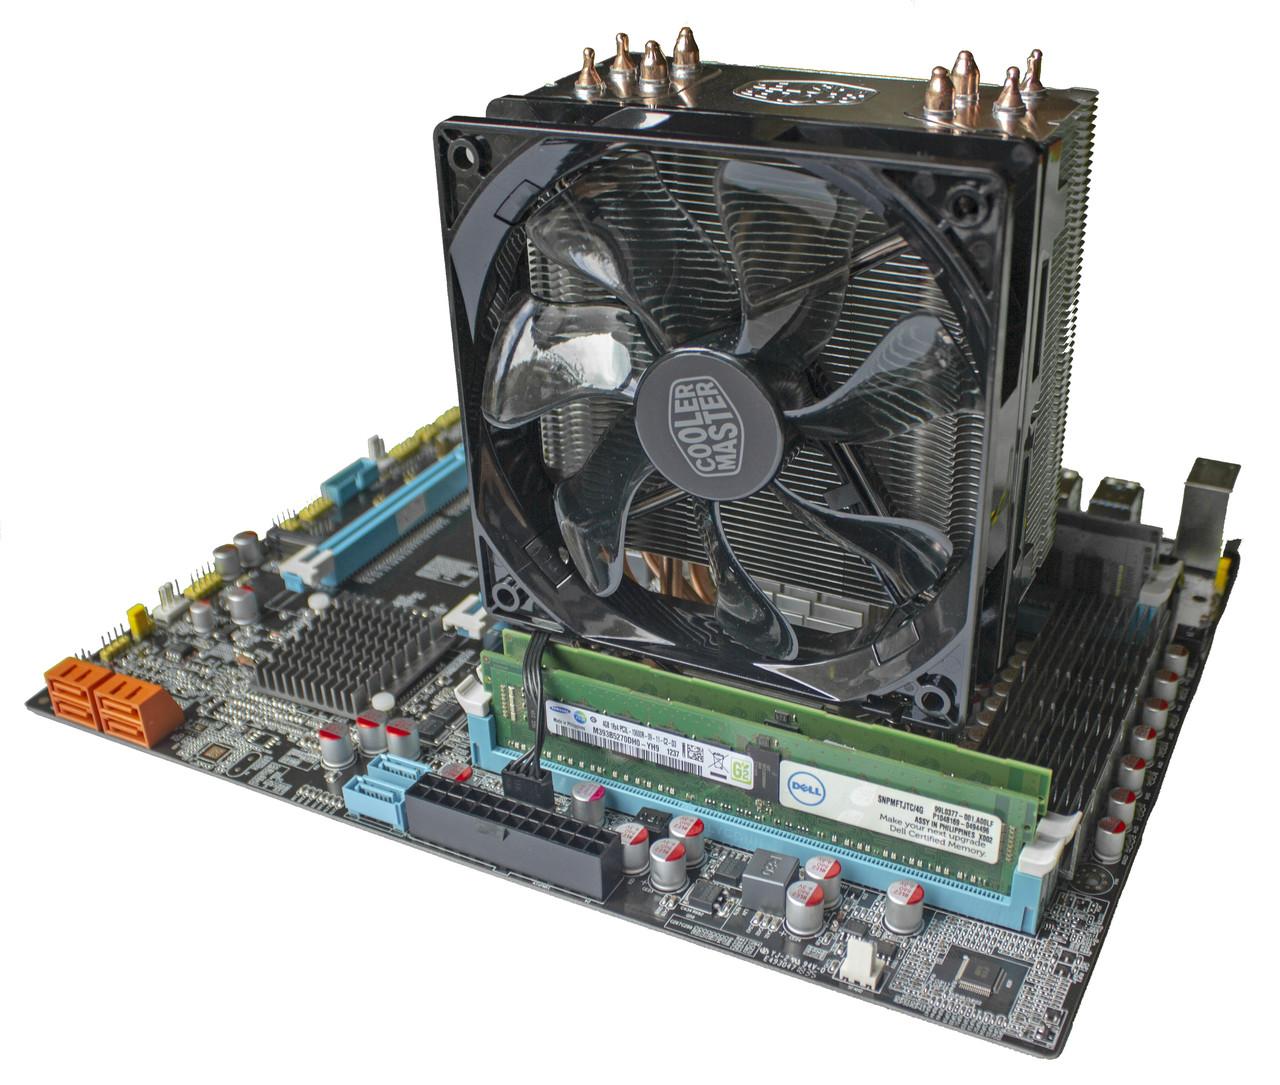 Комплект X79Z-2.4F + Xeon E5-2680v2 + 16 GB RAM + Кулер, LGA 2011